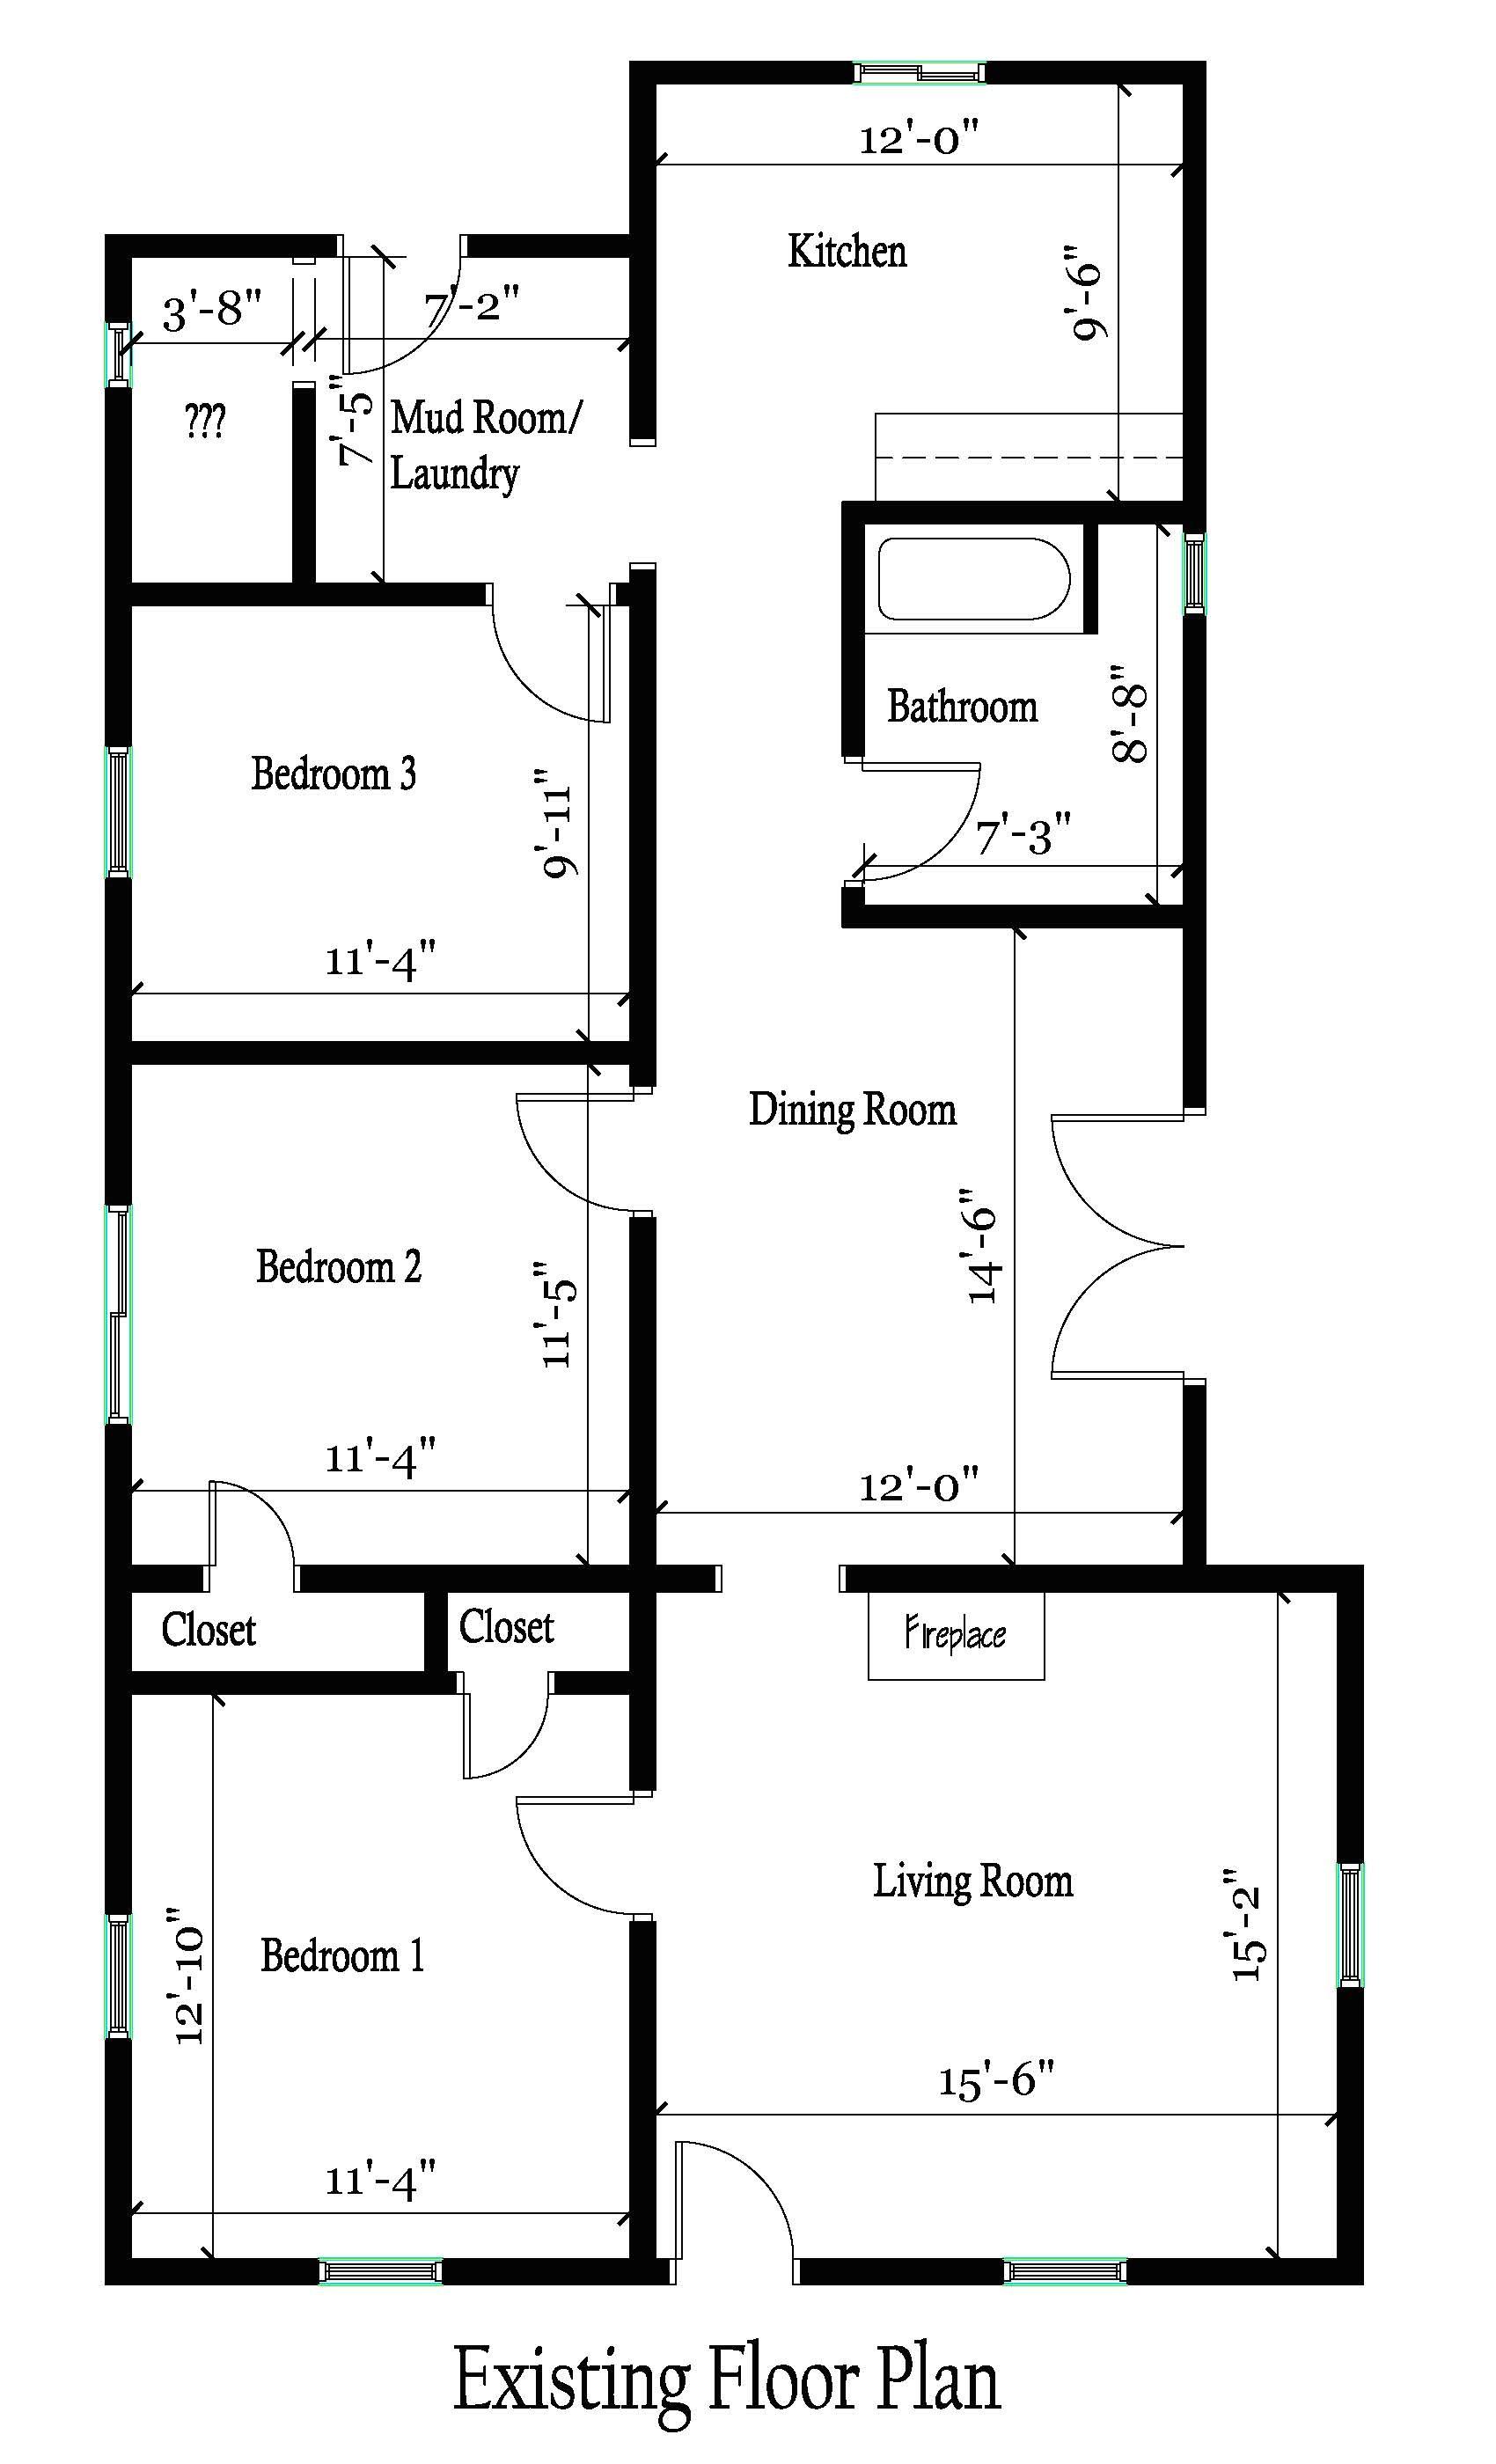 House Plans for Existing Homes Heartland House History Heartlandhouse